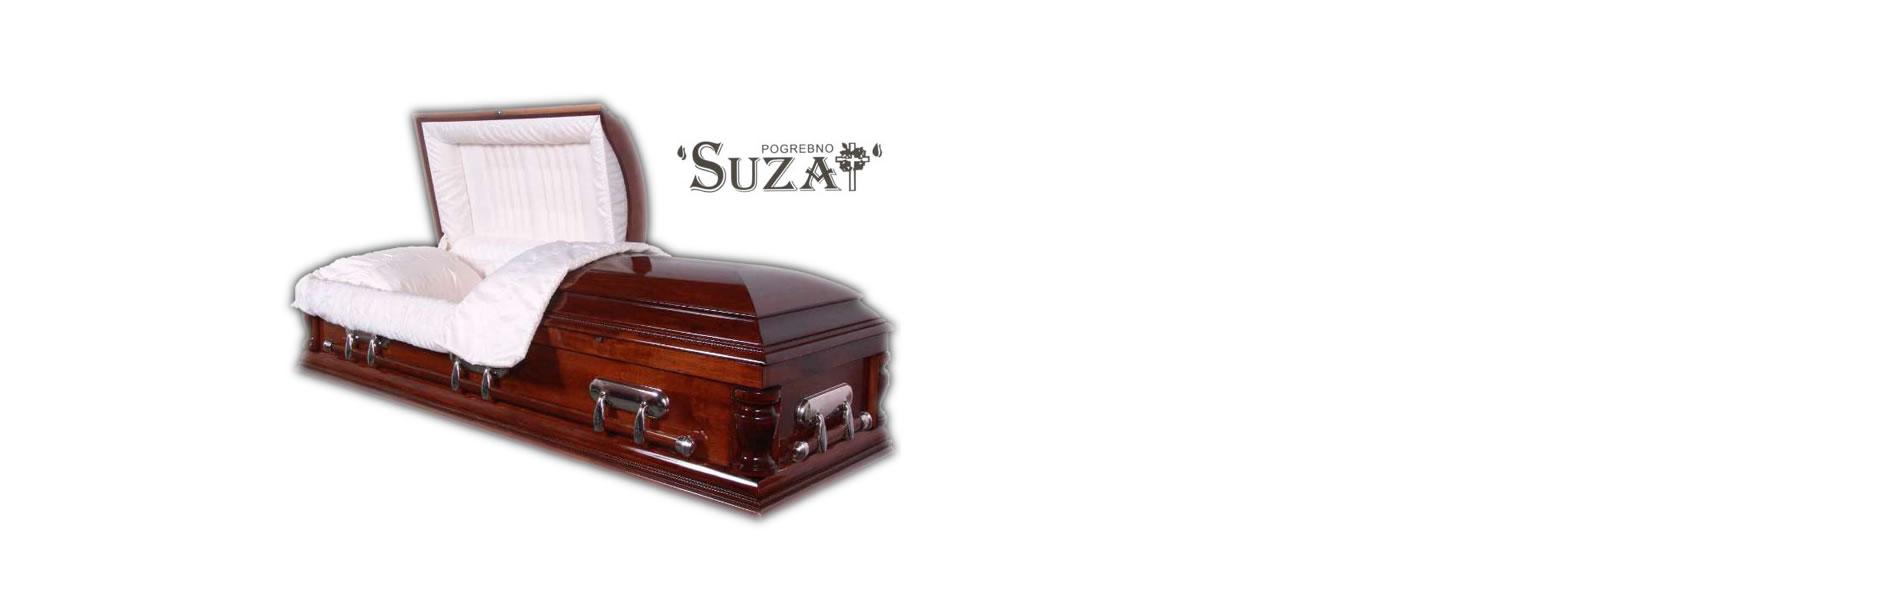 Pogrebno Suza Pančevo